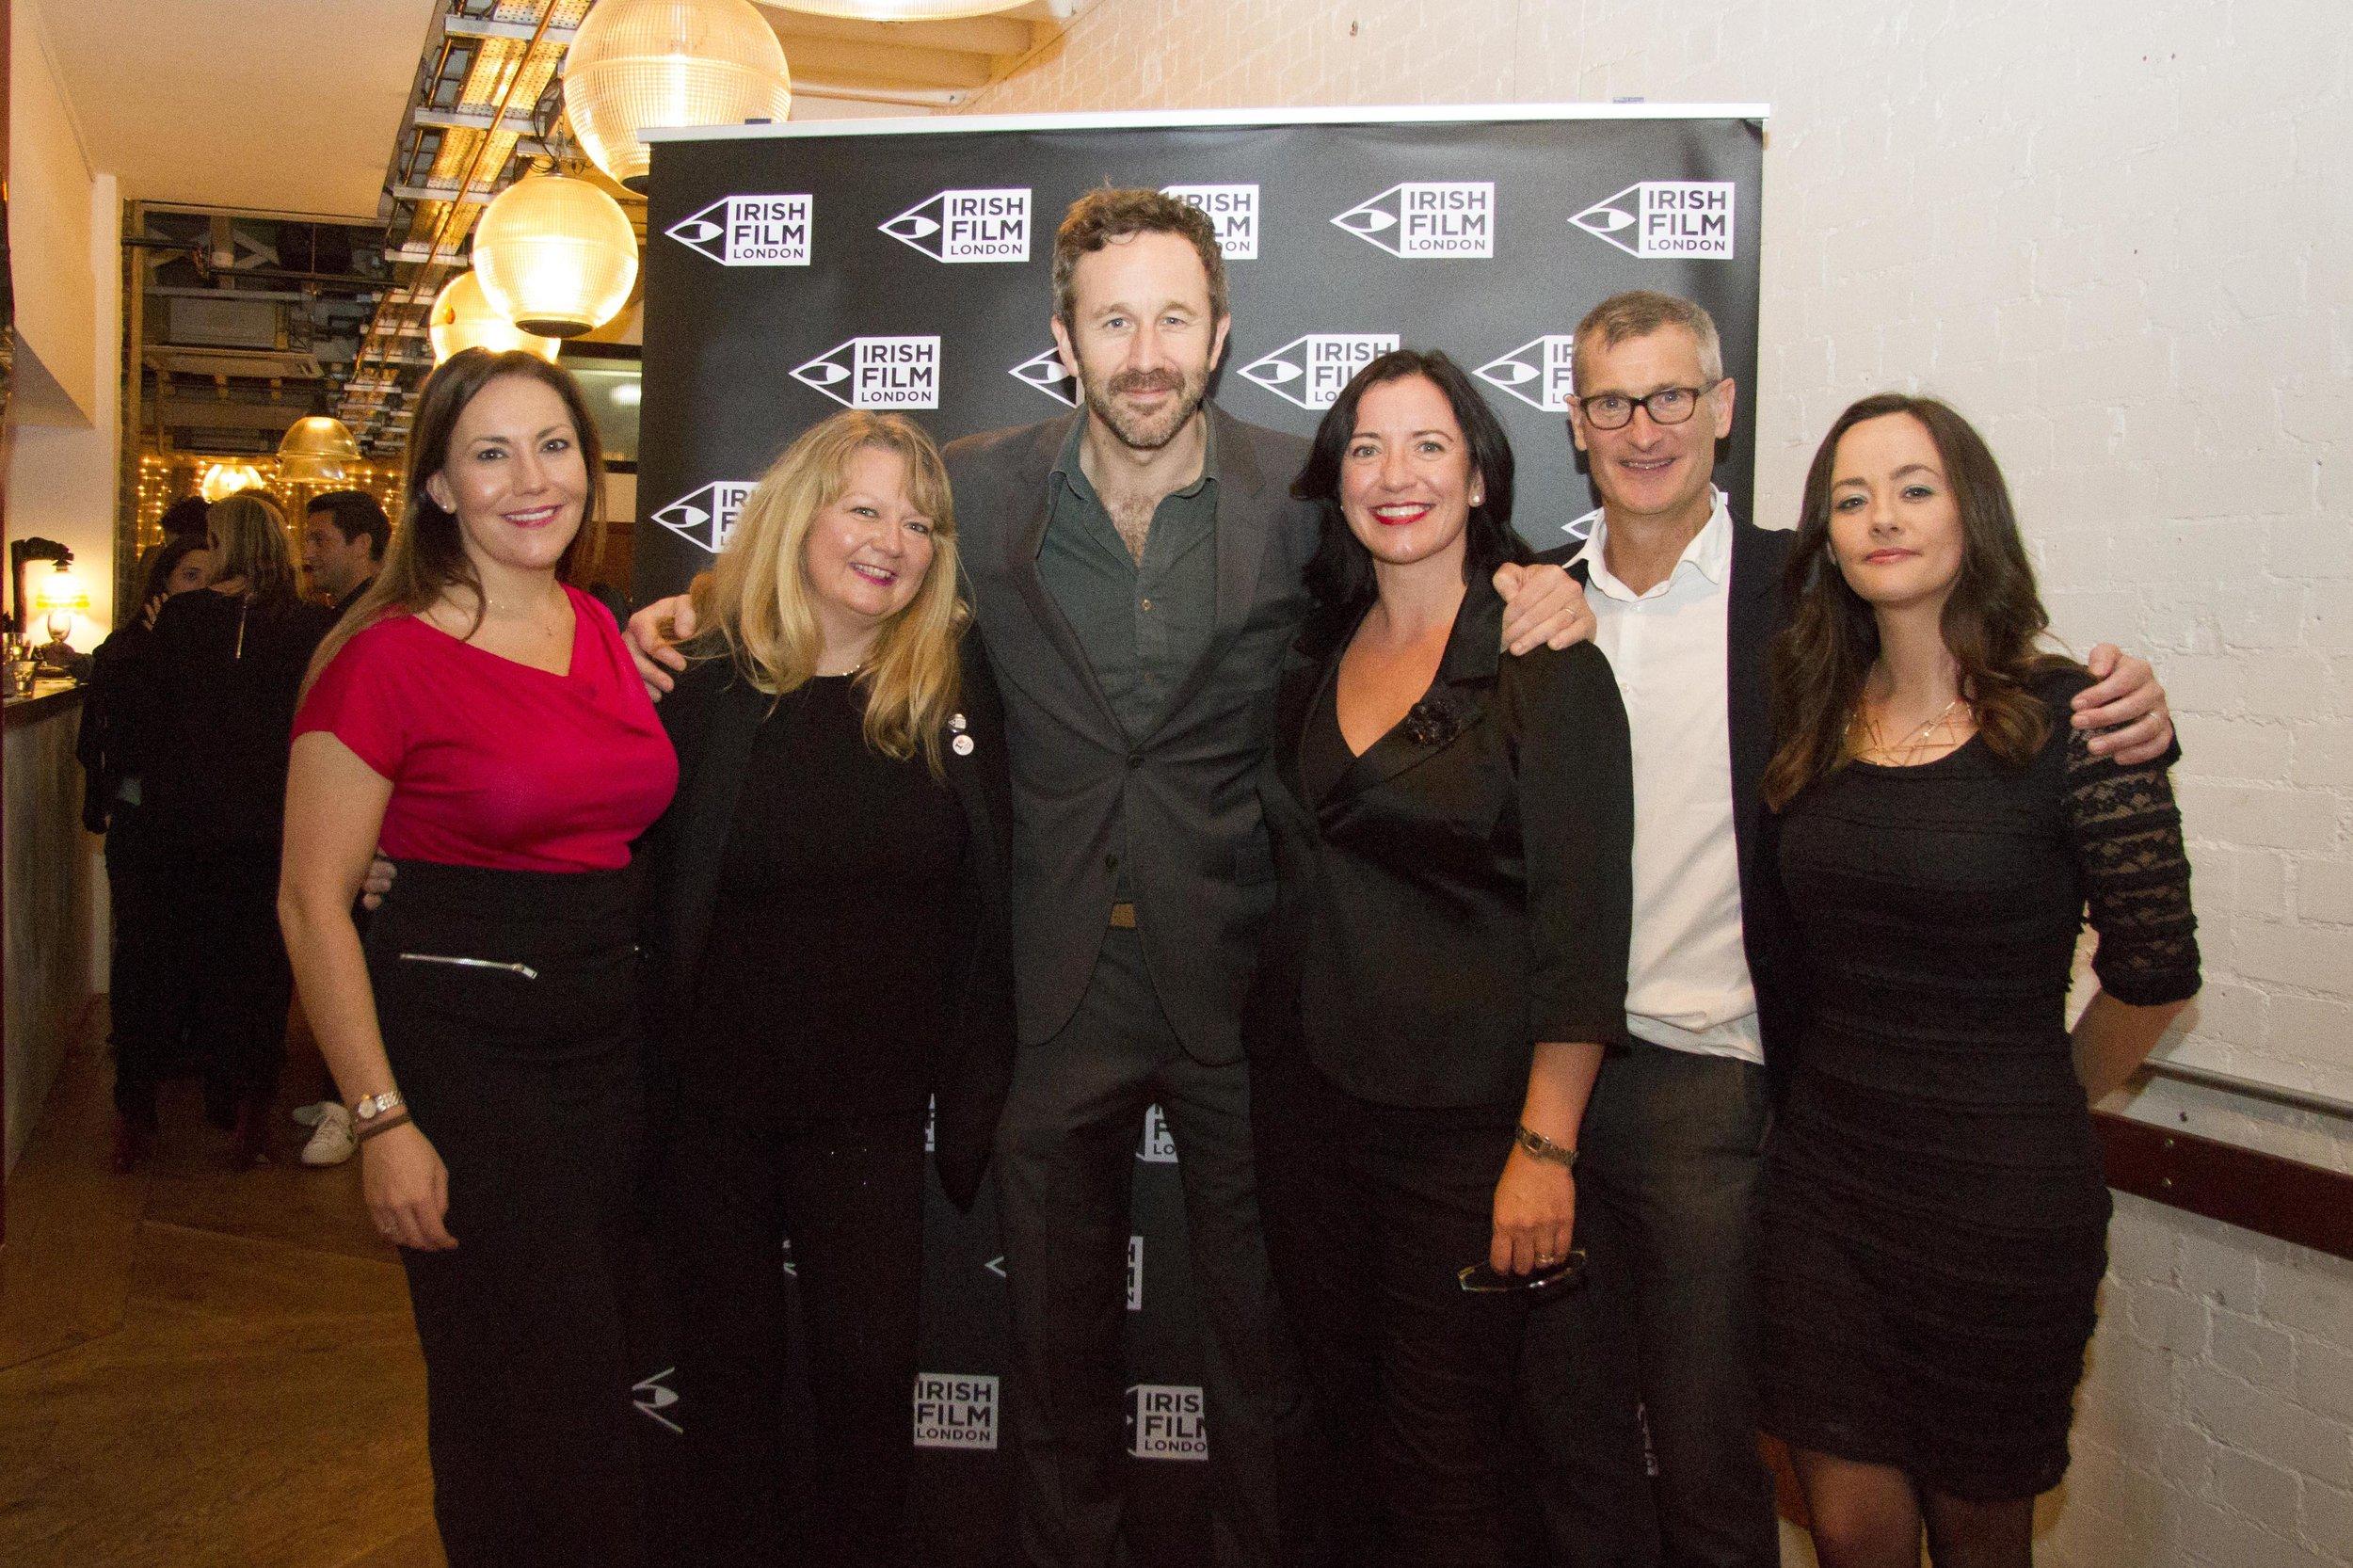 Black 47 London Premiere 2018 Photos courtesy of Noel Mullen Irish Film London 69 Irish Film London team with Chris O'Dowd.jpg